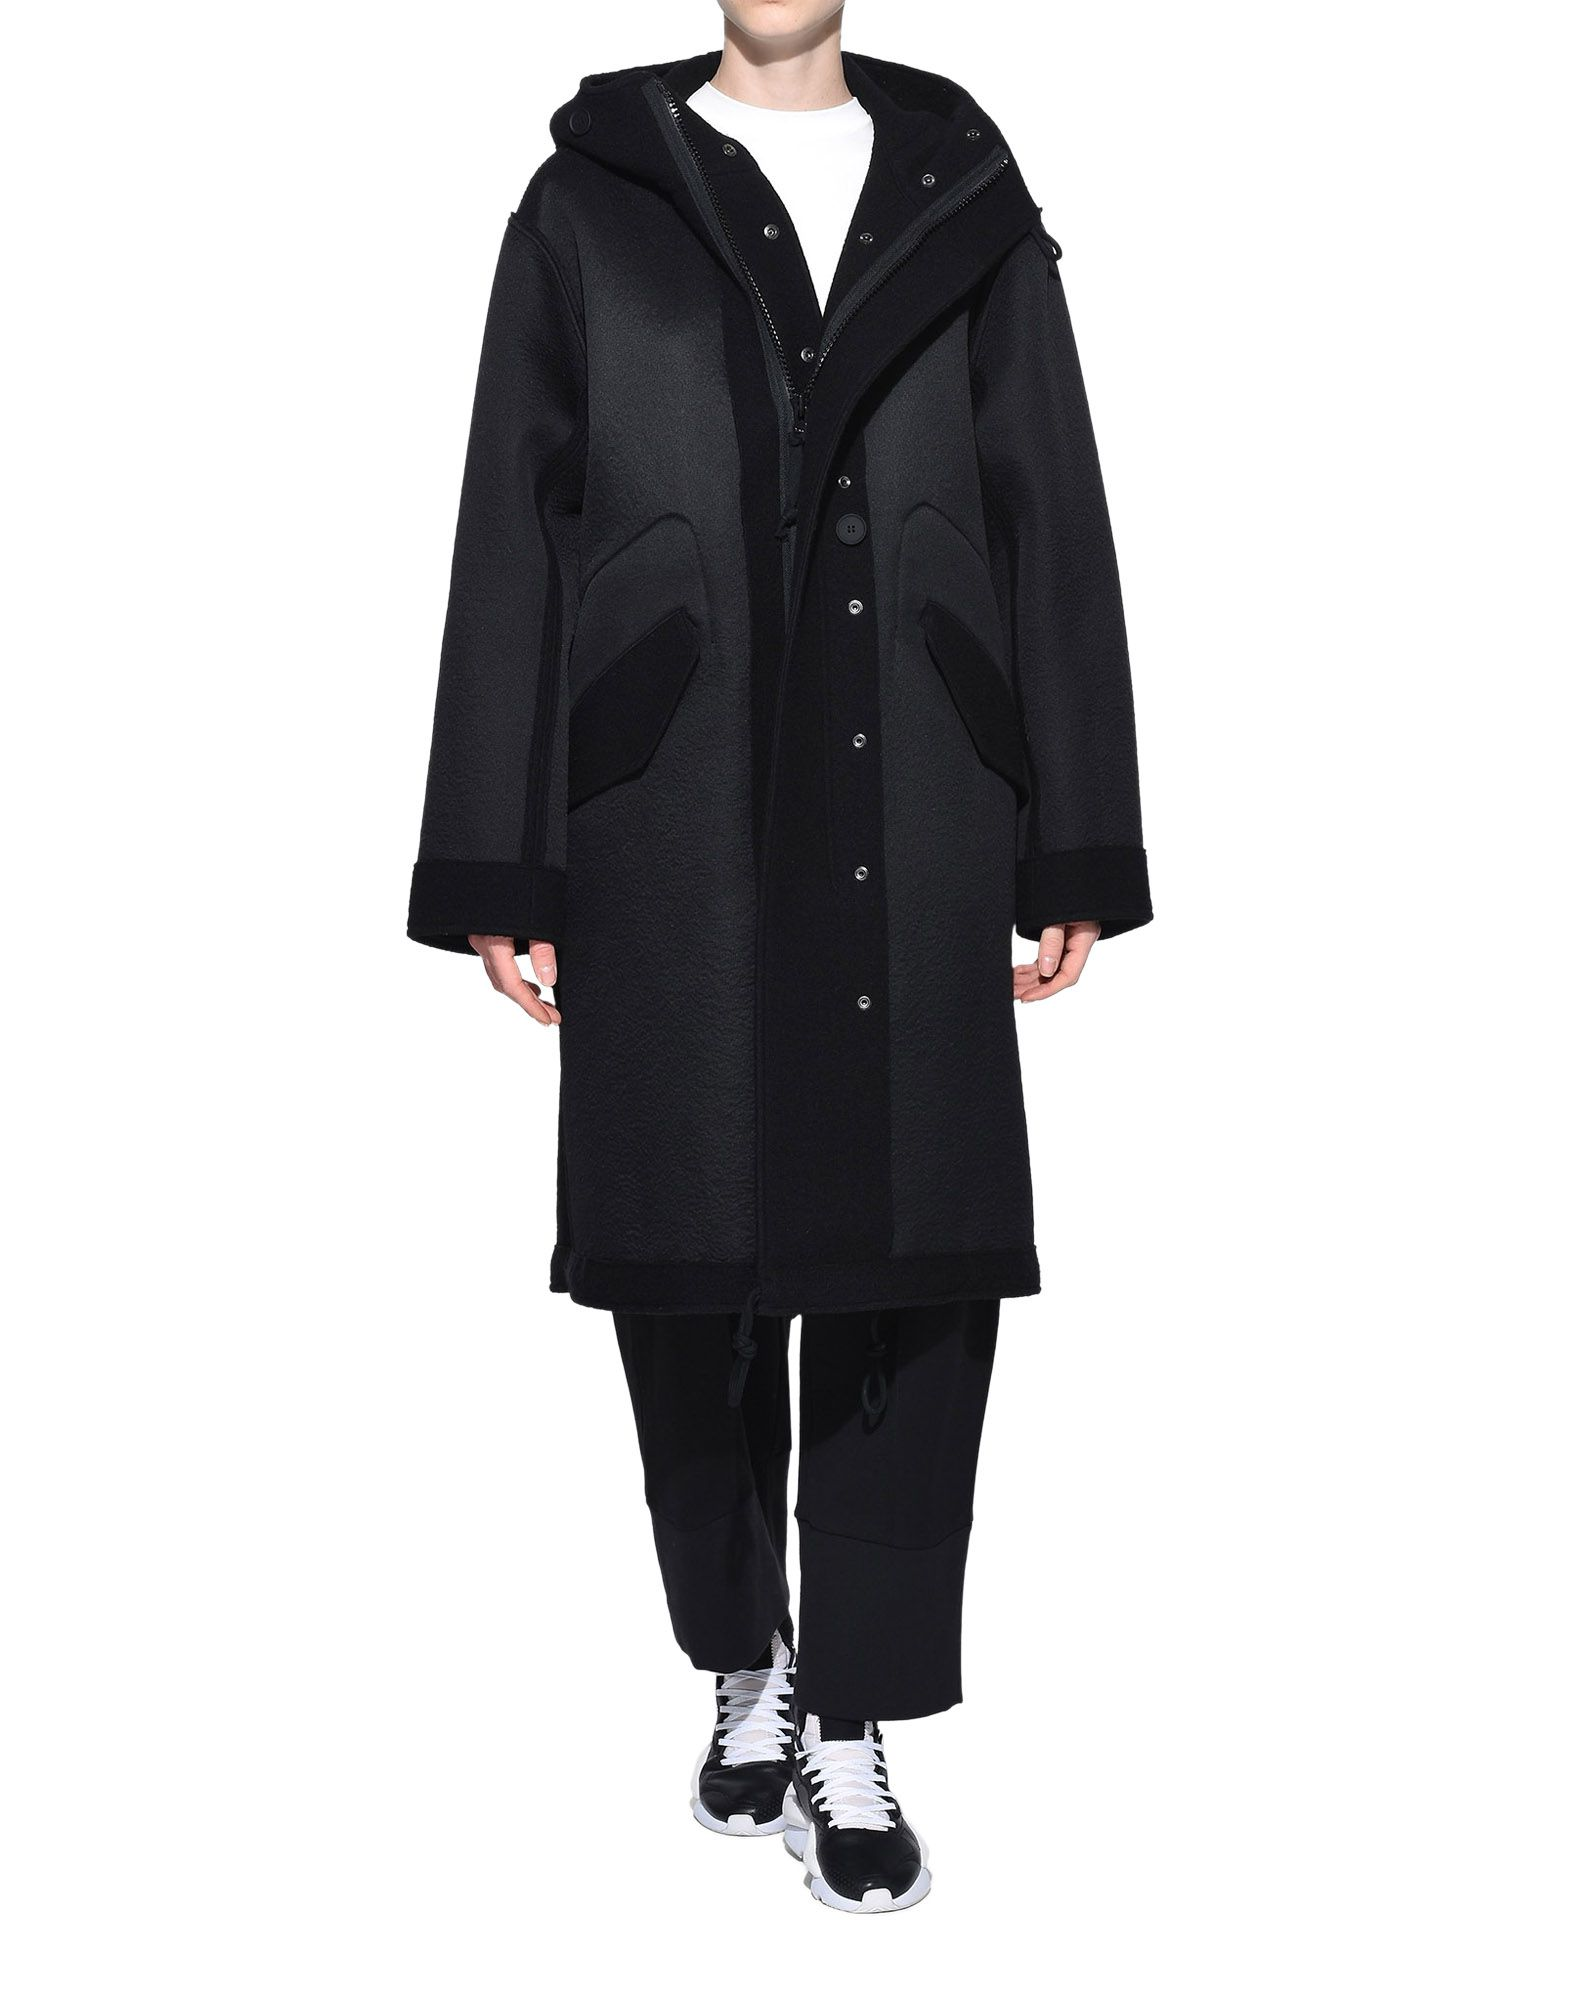 Y-3 Y-3 Reversible Wool Parka Coat Woman a